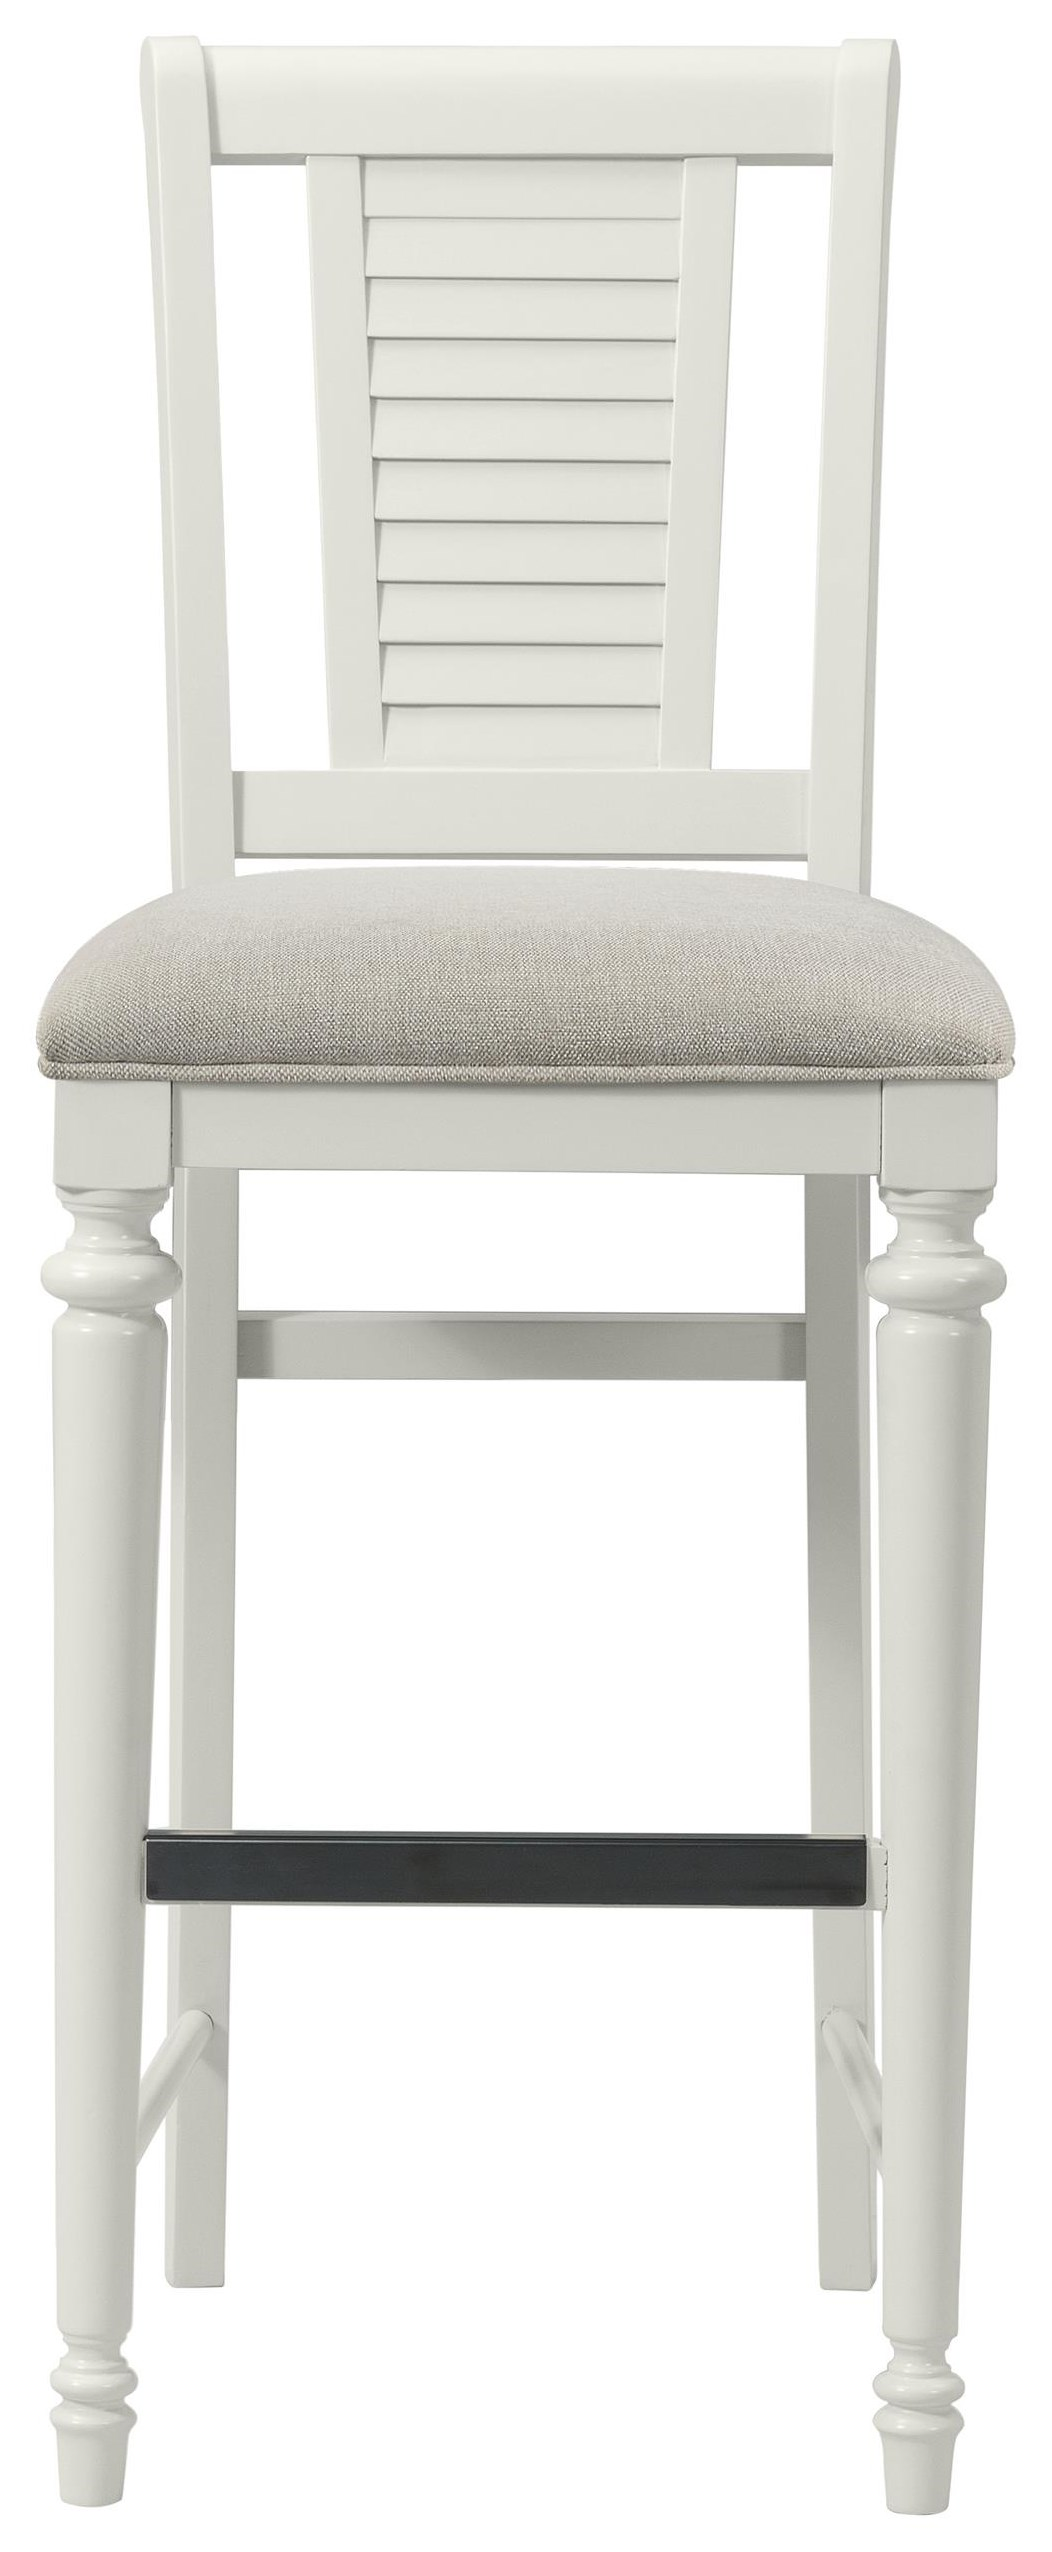 Harbortown Upholstered Bar Stool by Stillwater Furniture at Baer's Furniture